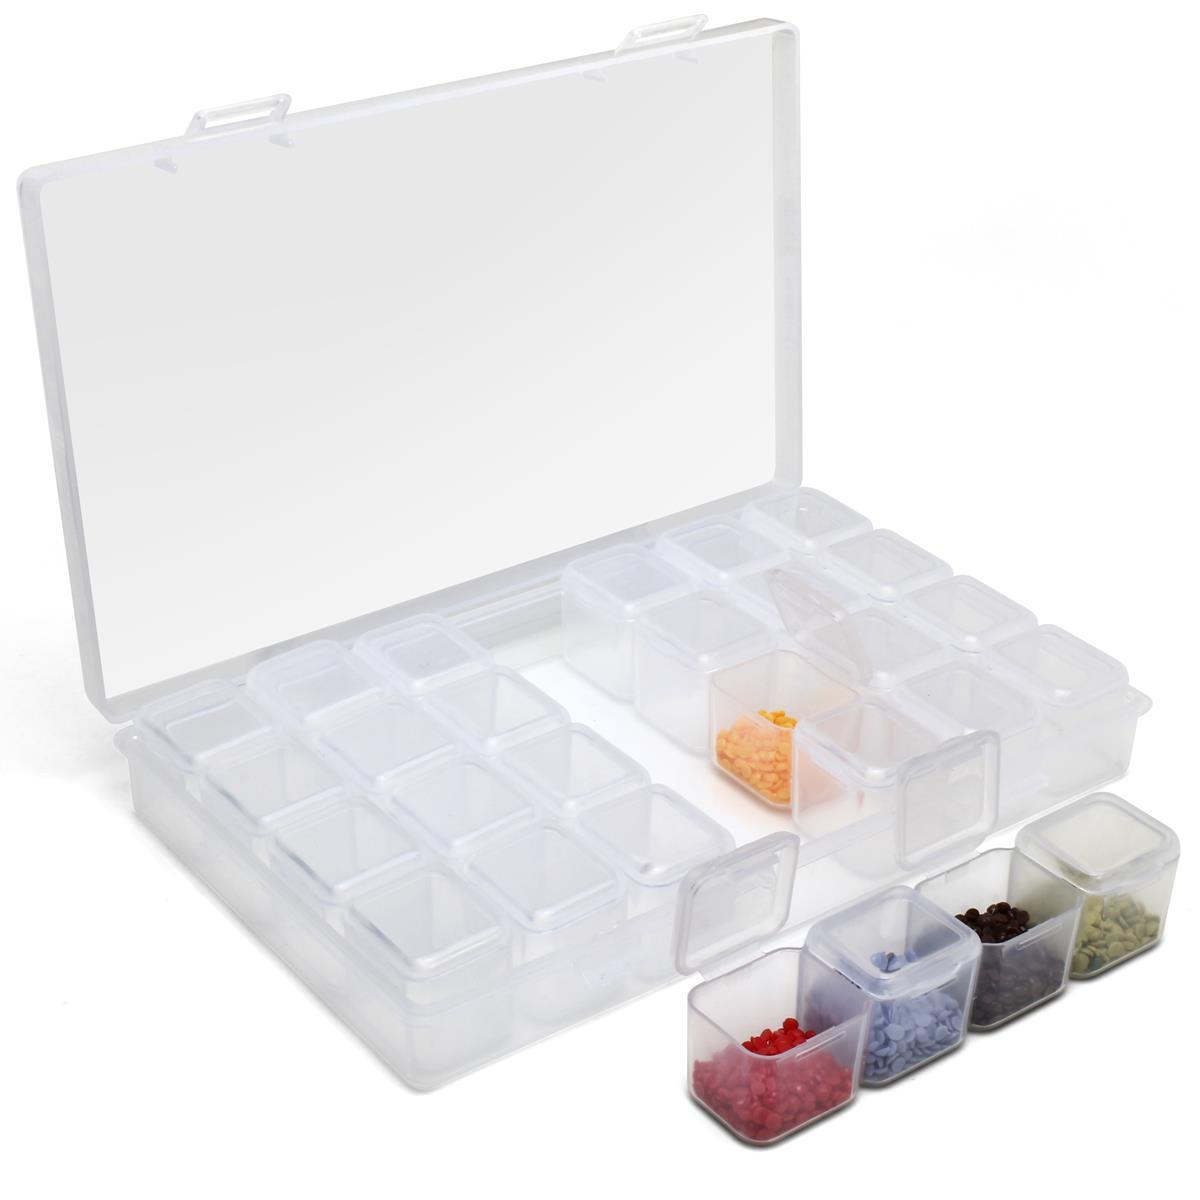 28-Diamond-Painting-Storage-Boxes-Bead-Organiser-Tray-Art-Beads-Embroidery-Case thumbnail 10